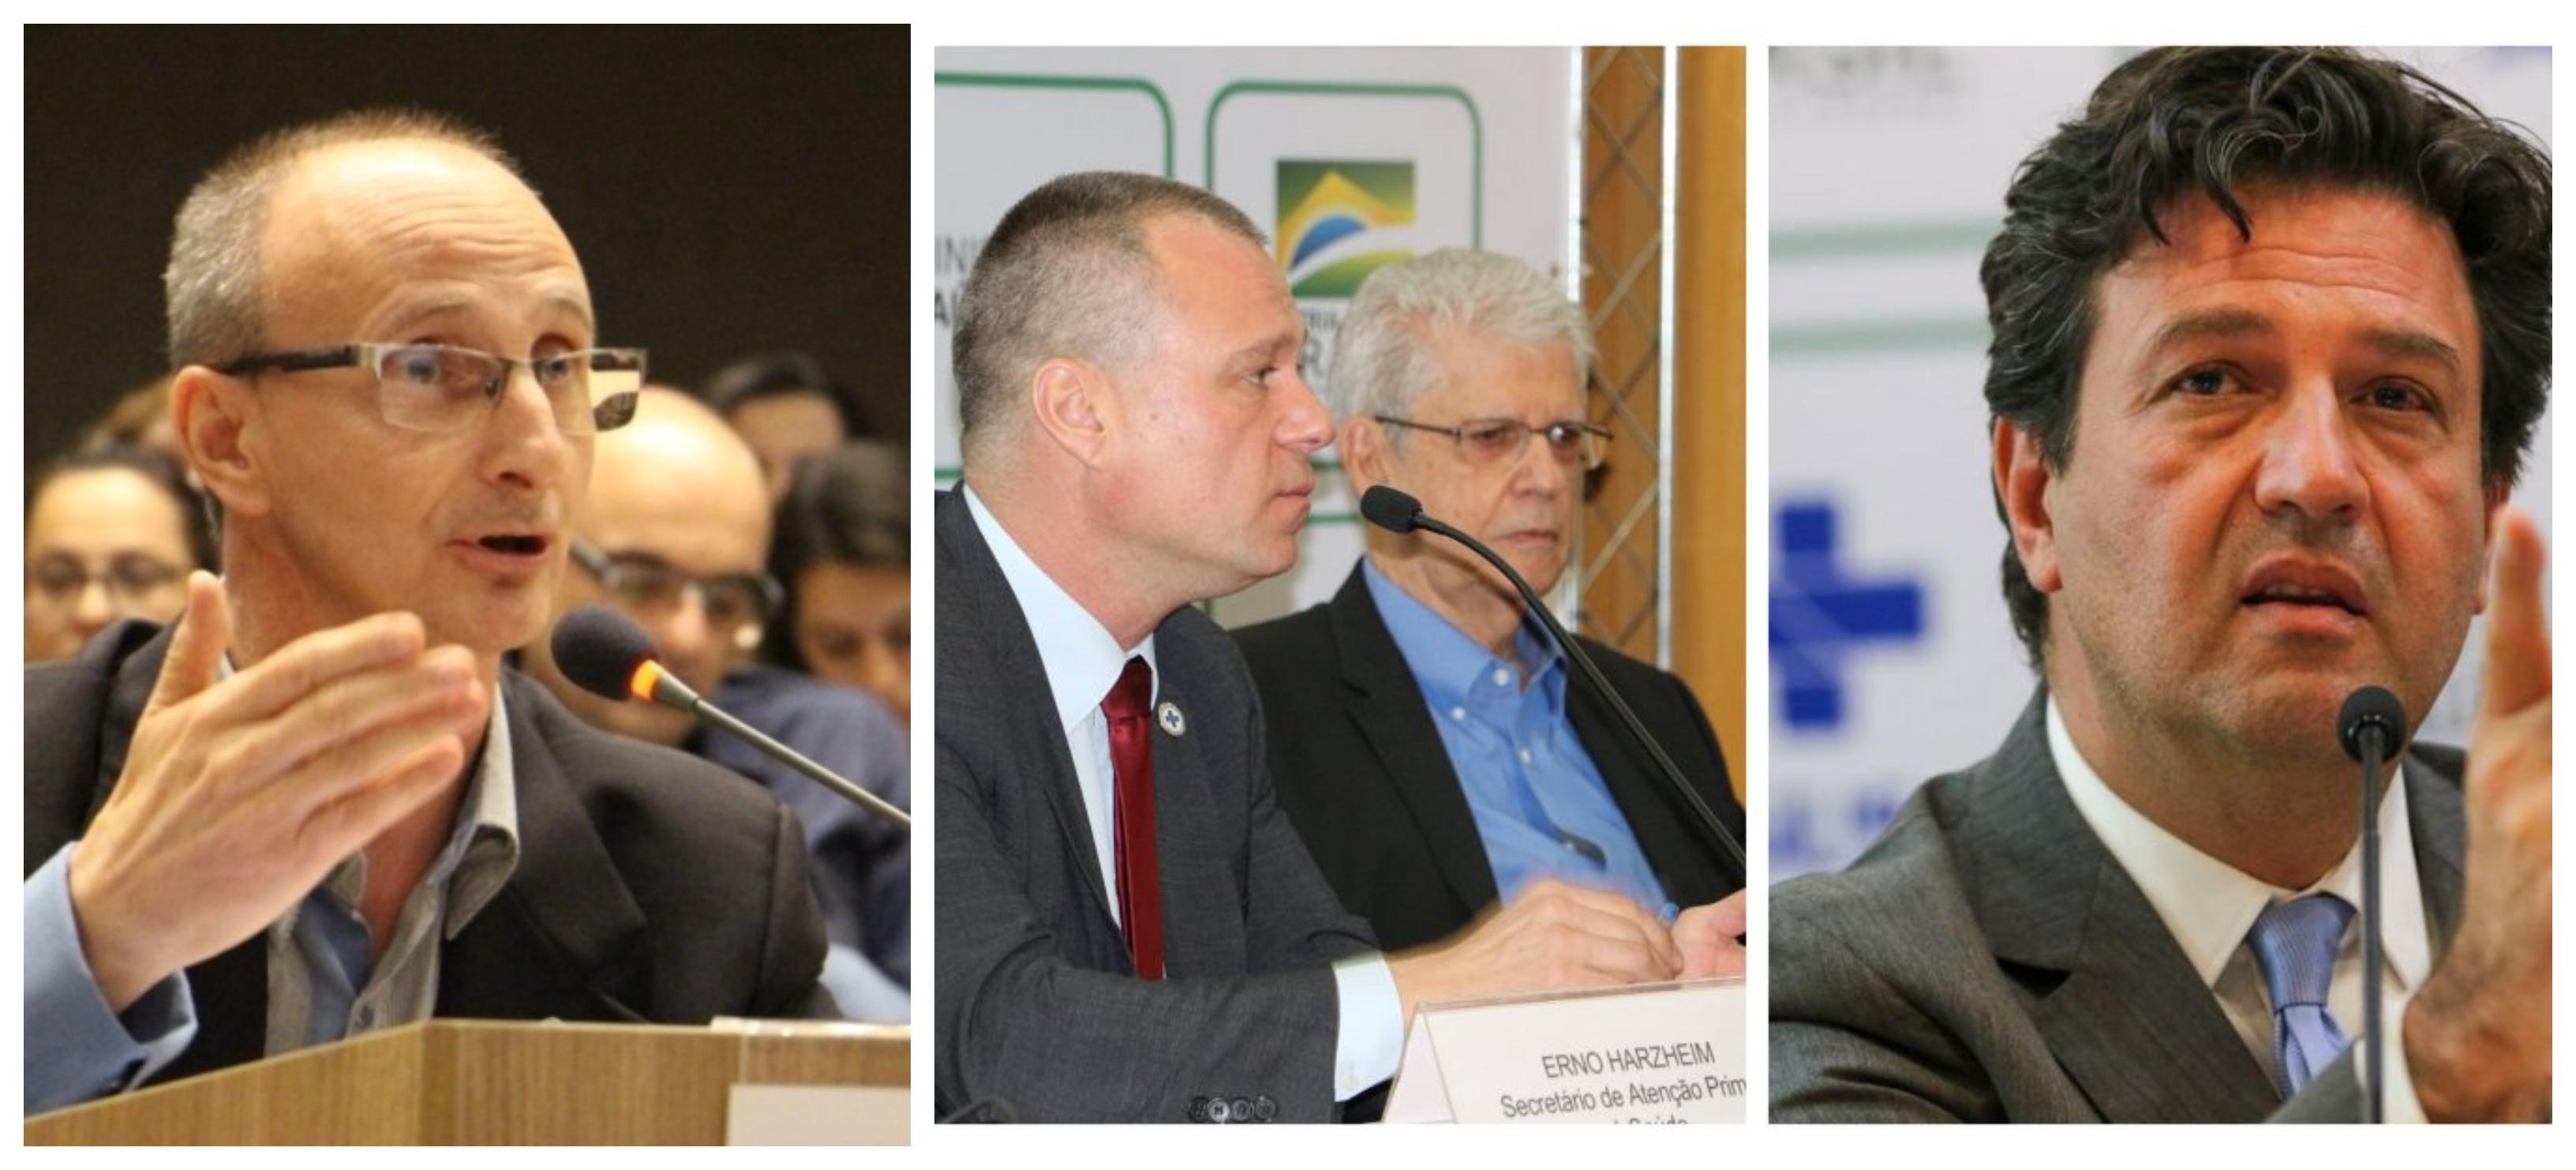 Conselho Nacional de Saúde debate portaria que altera financiamento do SUS